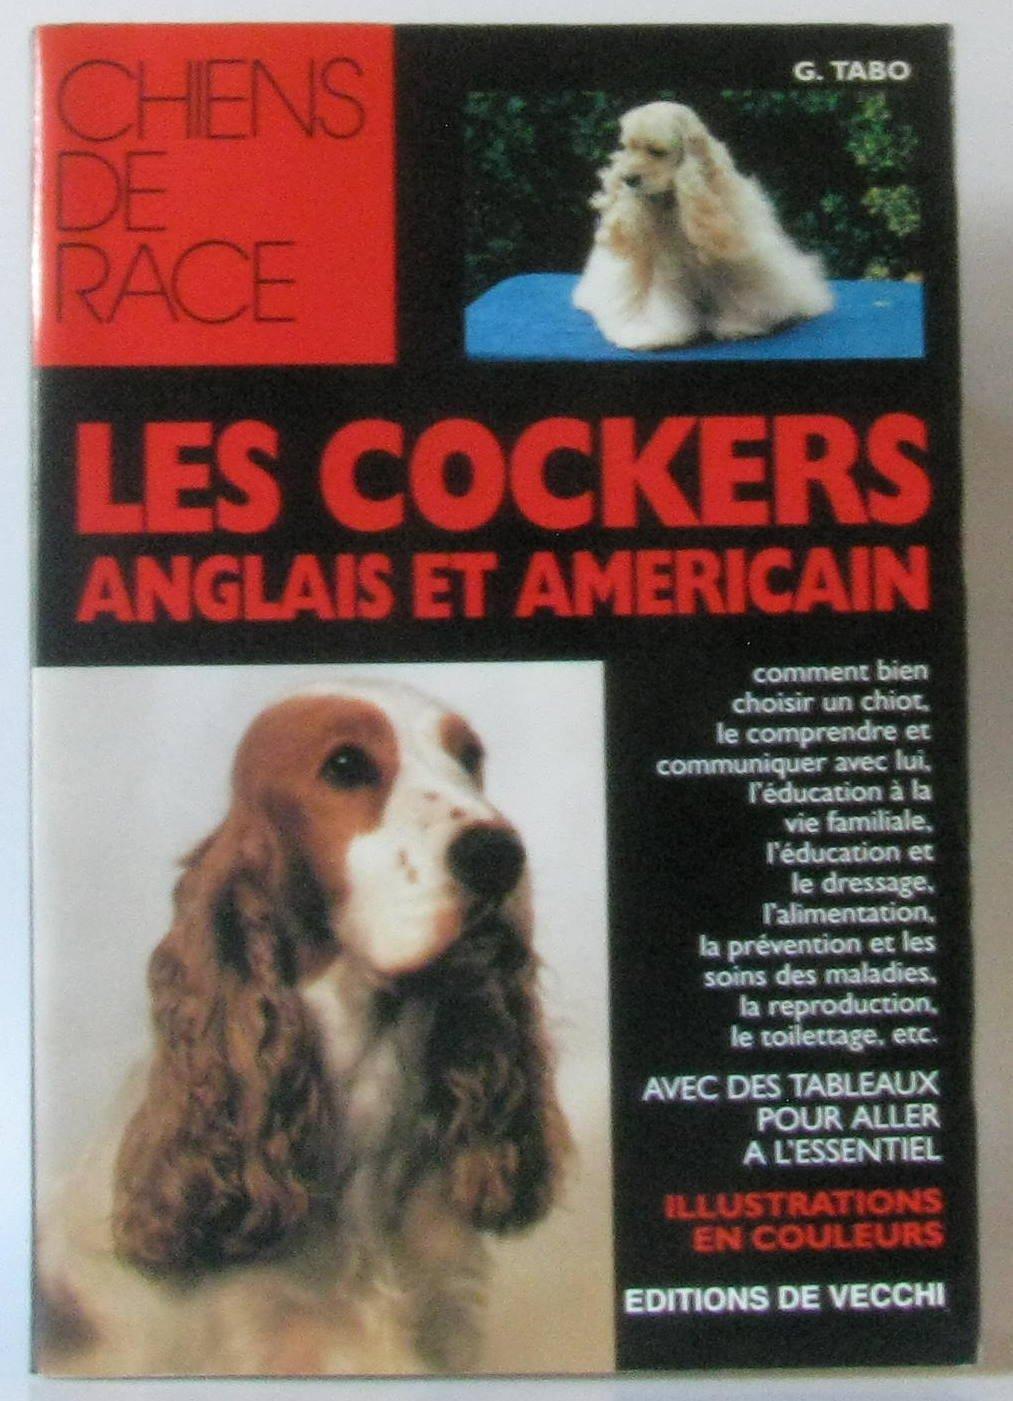 Les cockers anglais et américain Broché – 1 mai 1996 Giobatta Tabo De Vecchi 2732821659 Animaux/nature